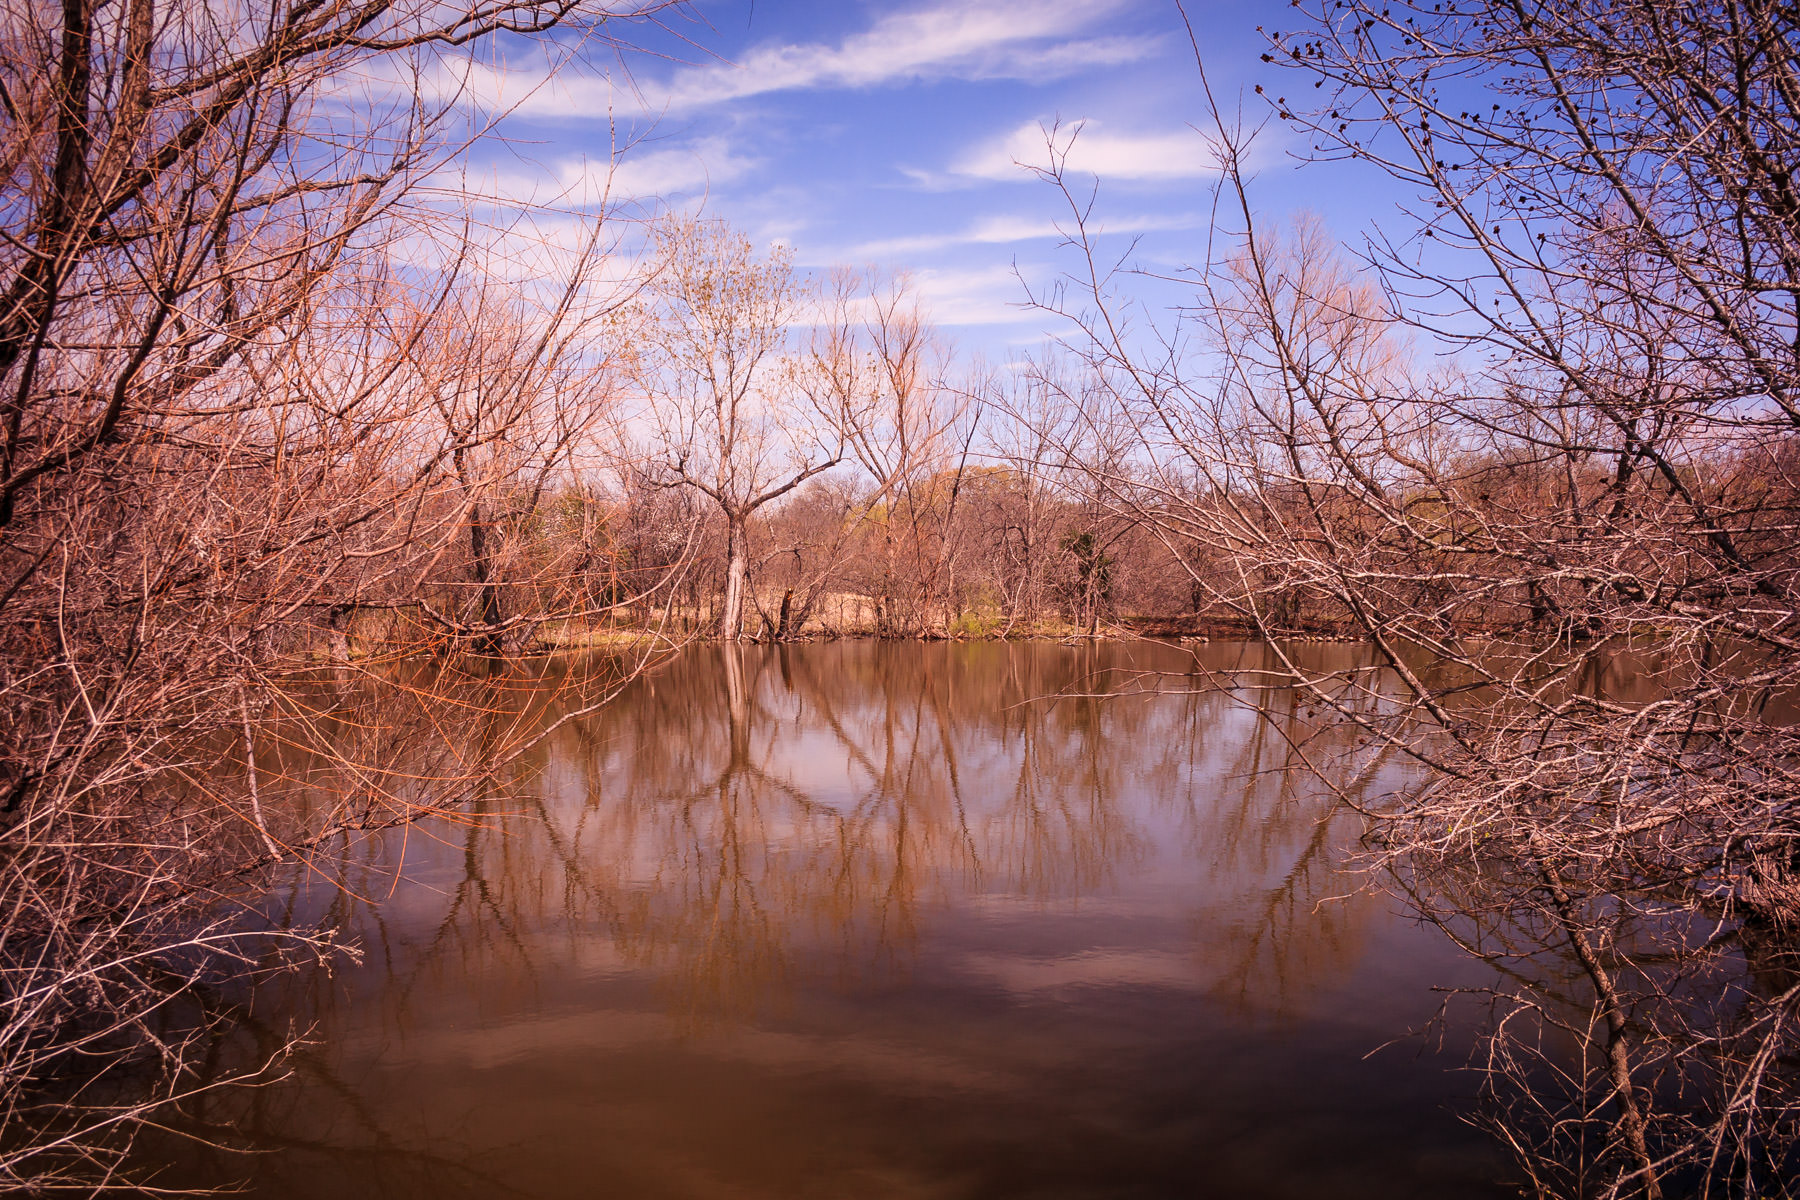 A pond at Plano, Texas' Arbor Hills Nature Preserve.